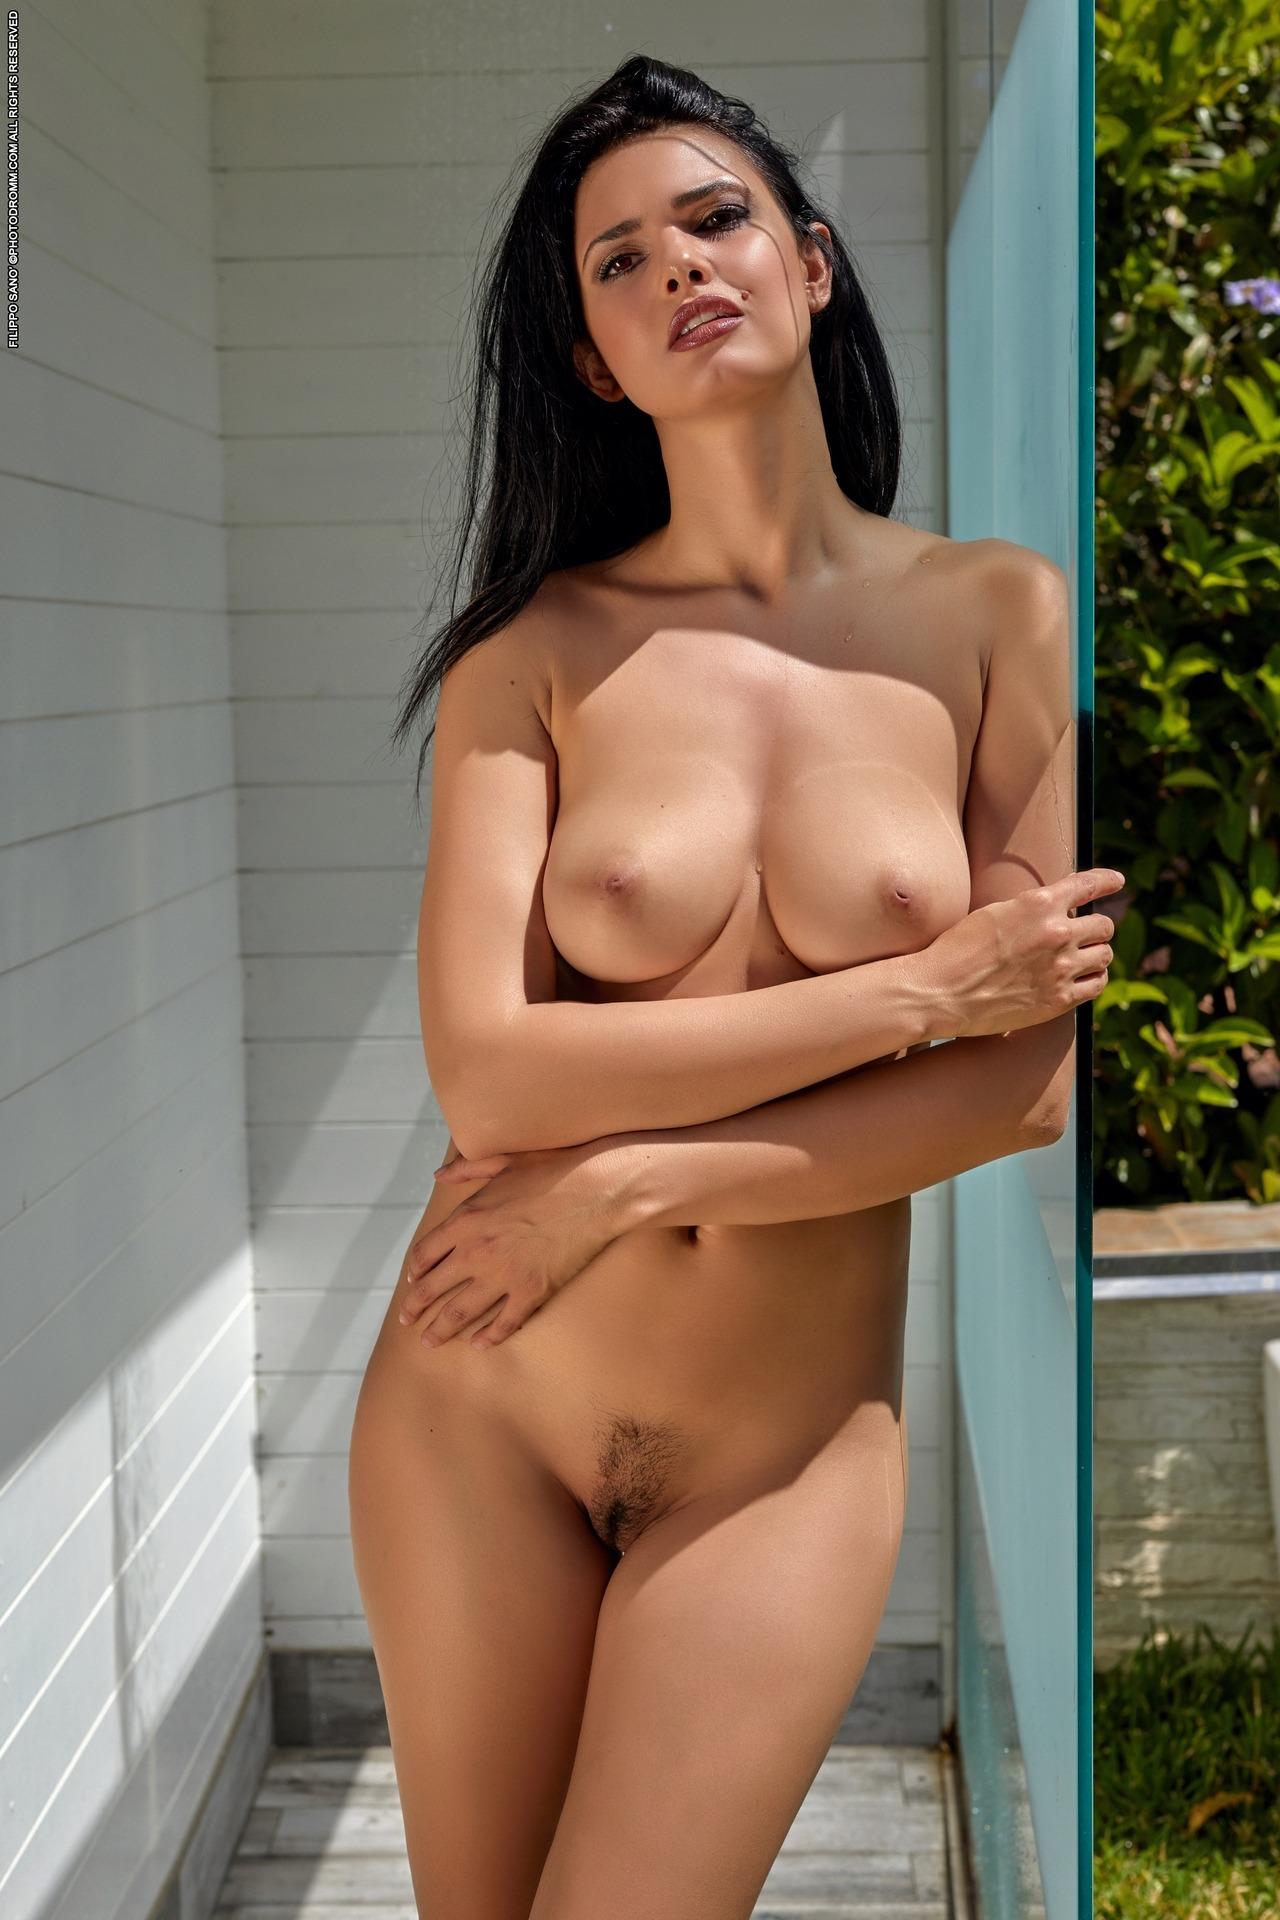 Hd Naked Model